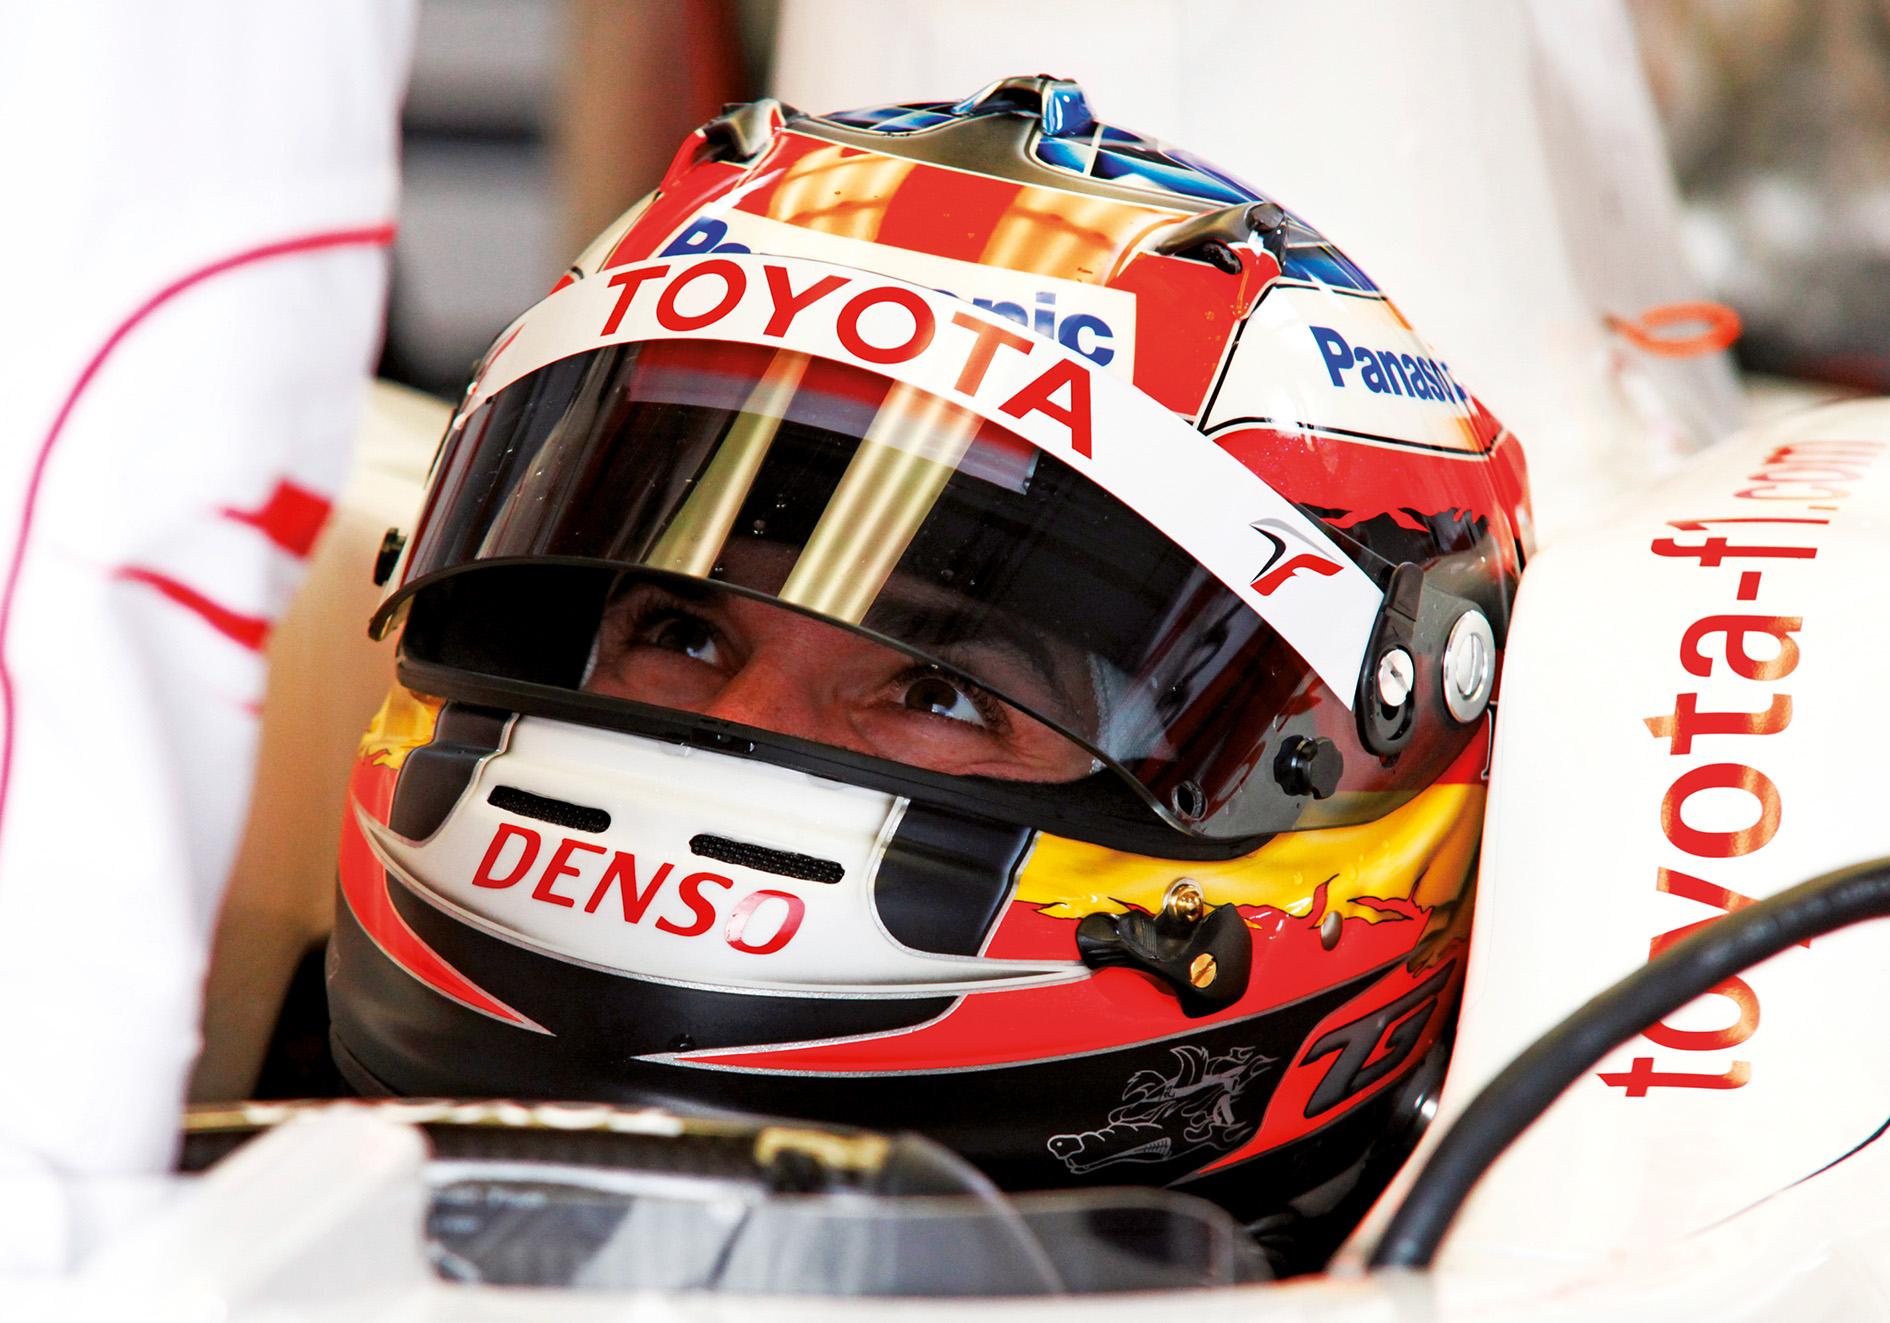 25_Josekdesign_Toyota_F1_Fotografie.jpg